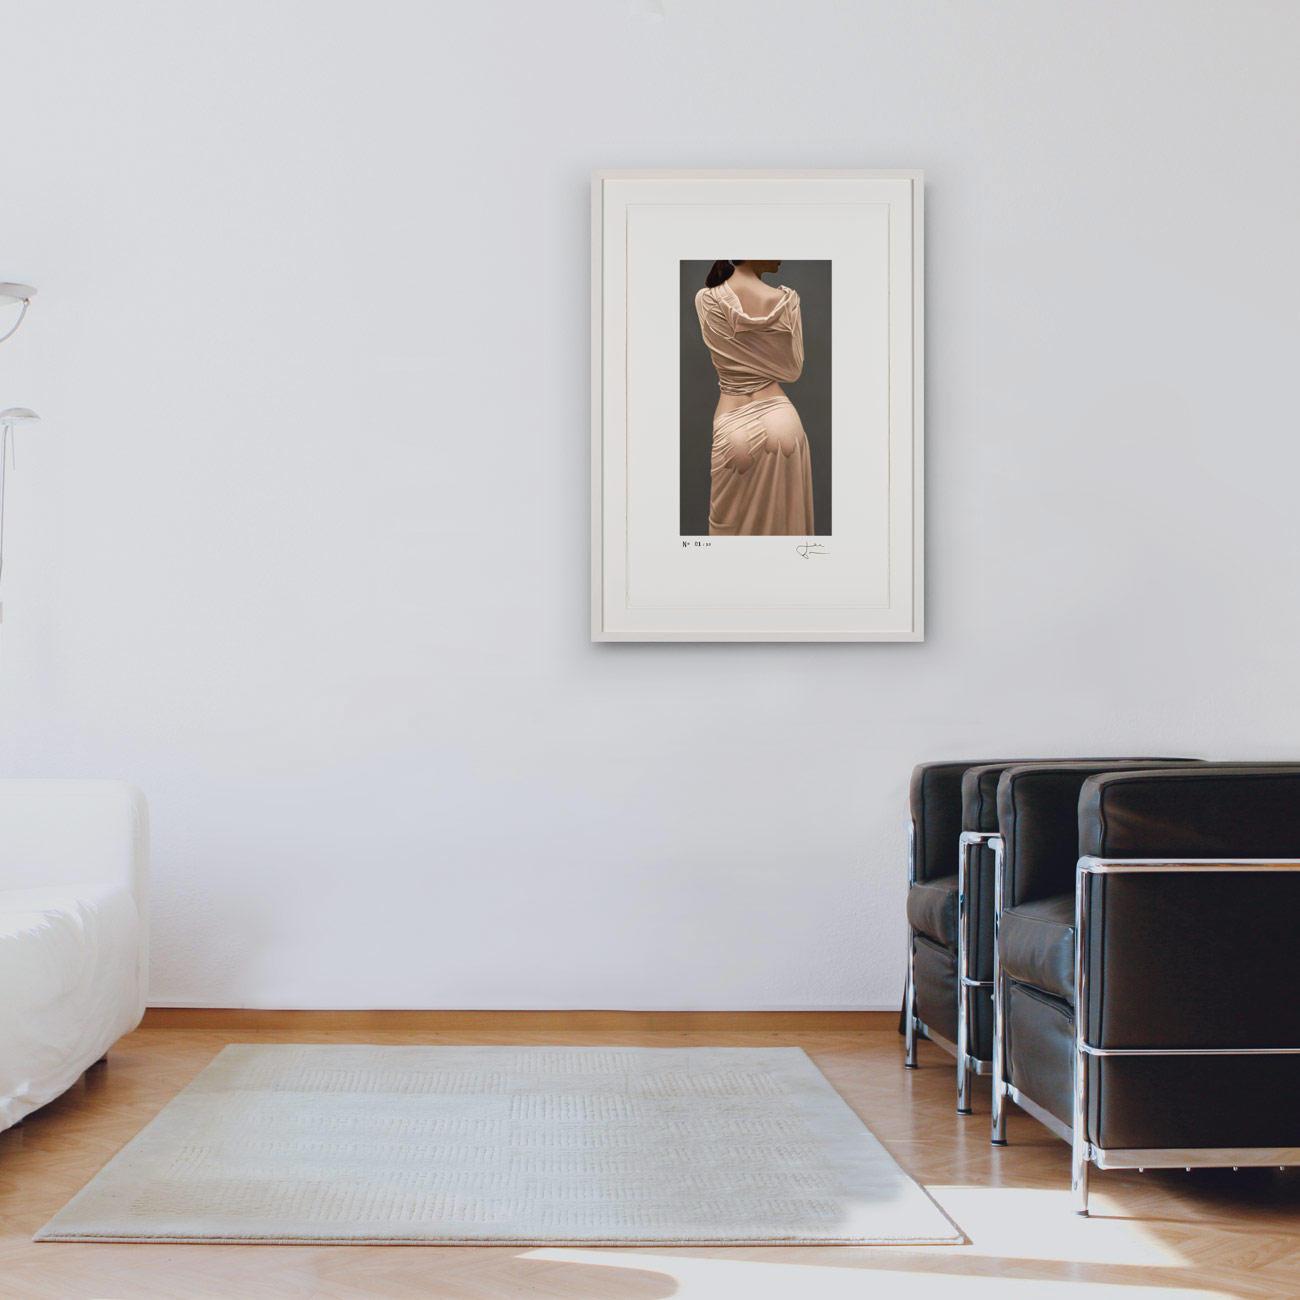 willi kissmer seide kaufen pro idee kunstformat. Black Bedroom Furniture Sets. Home Design Ideas